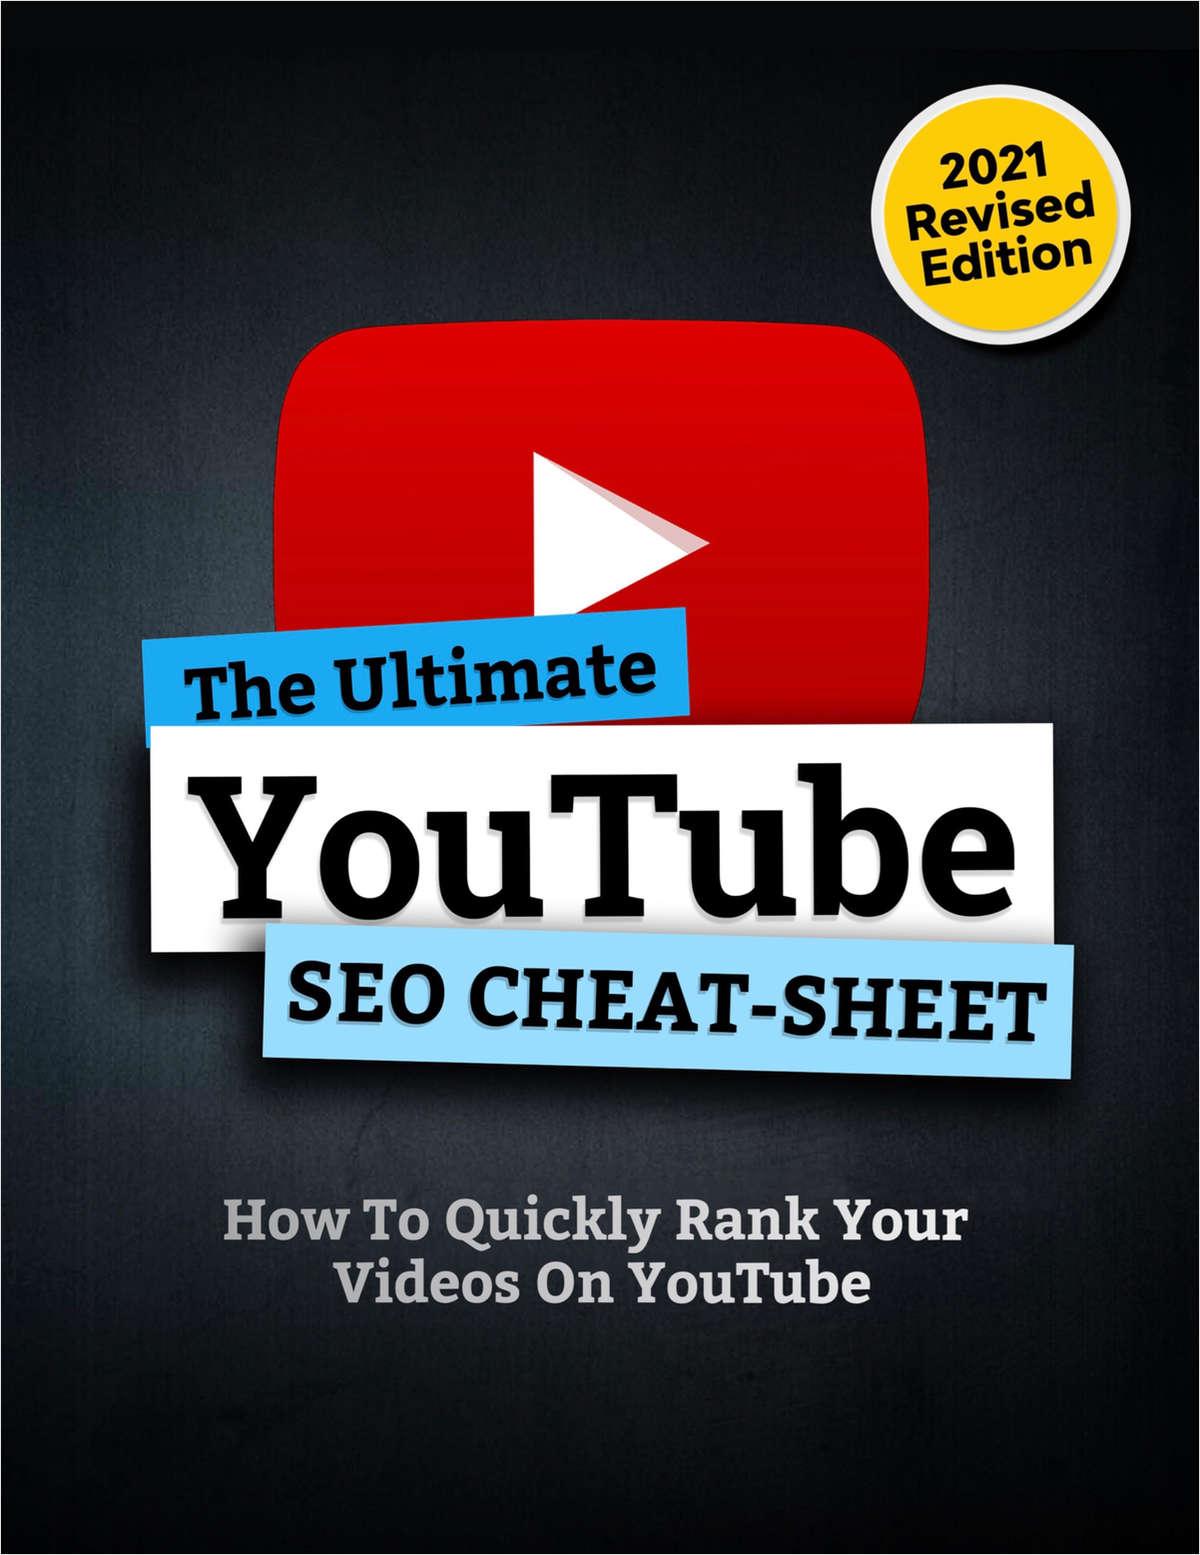 The Ultimate YouTube SEO Cheat Sheet